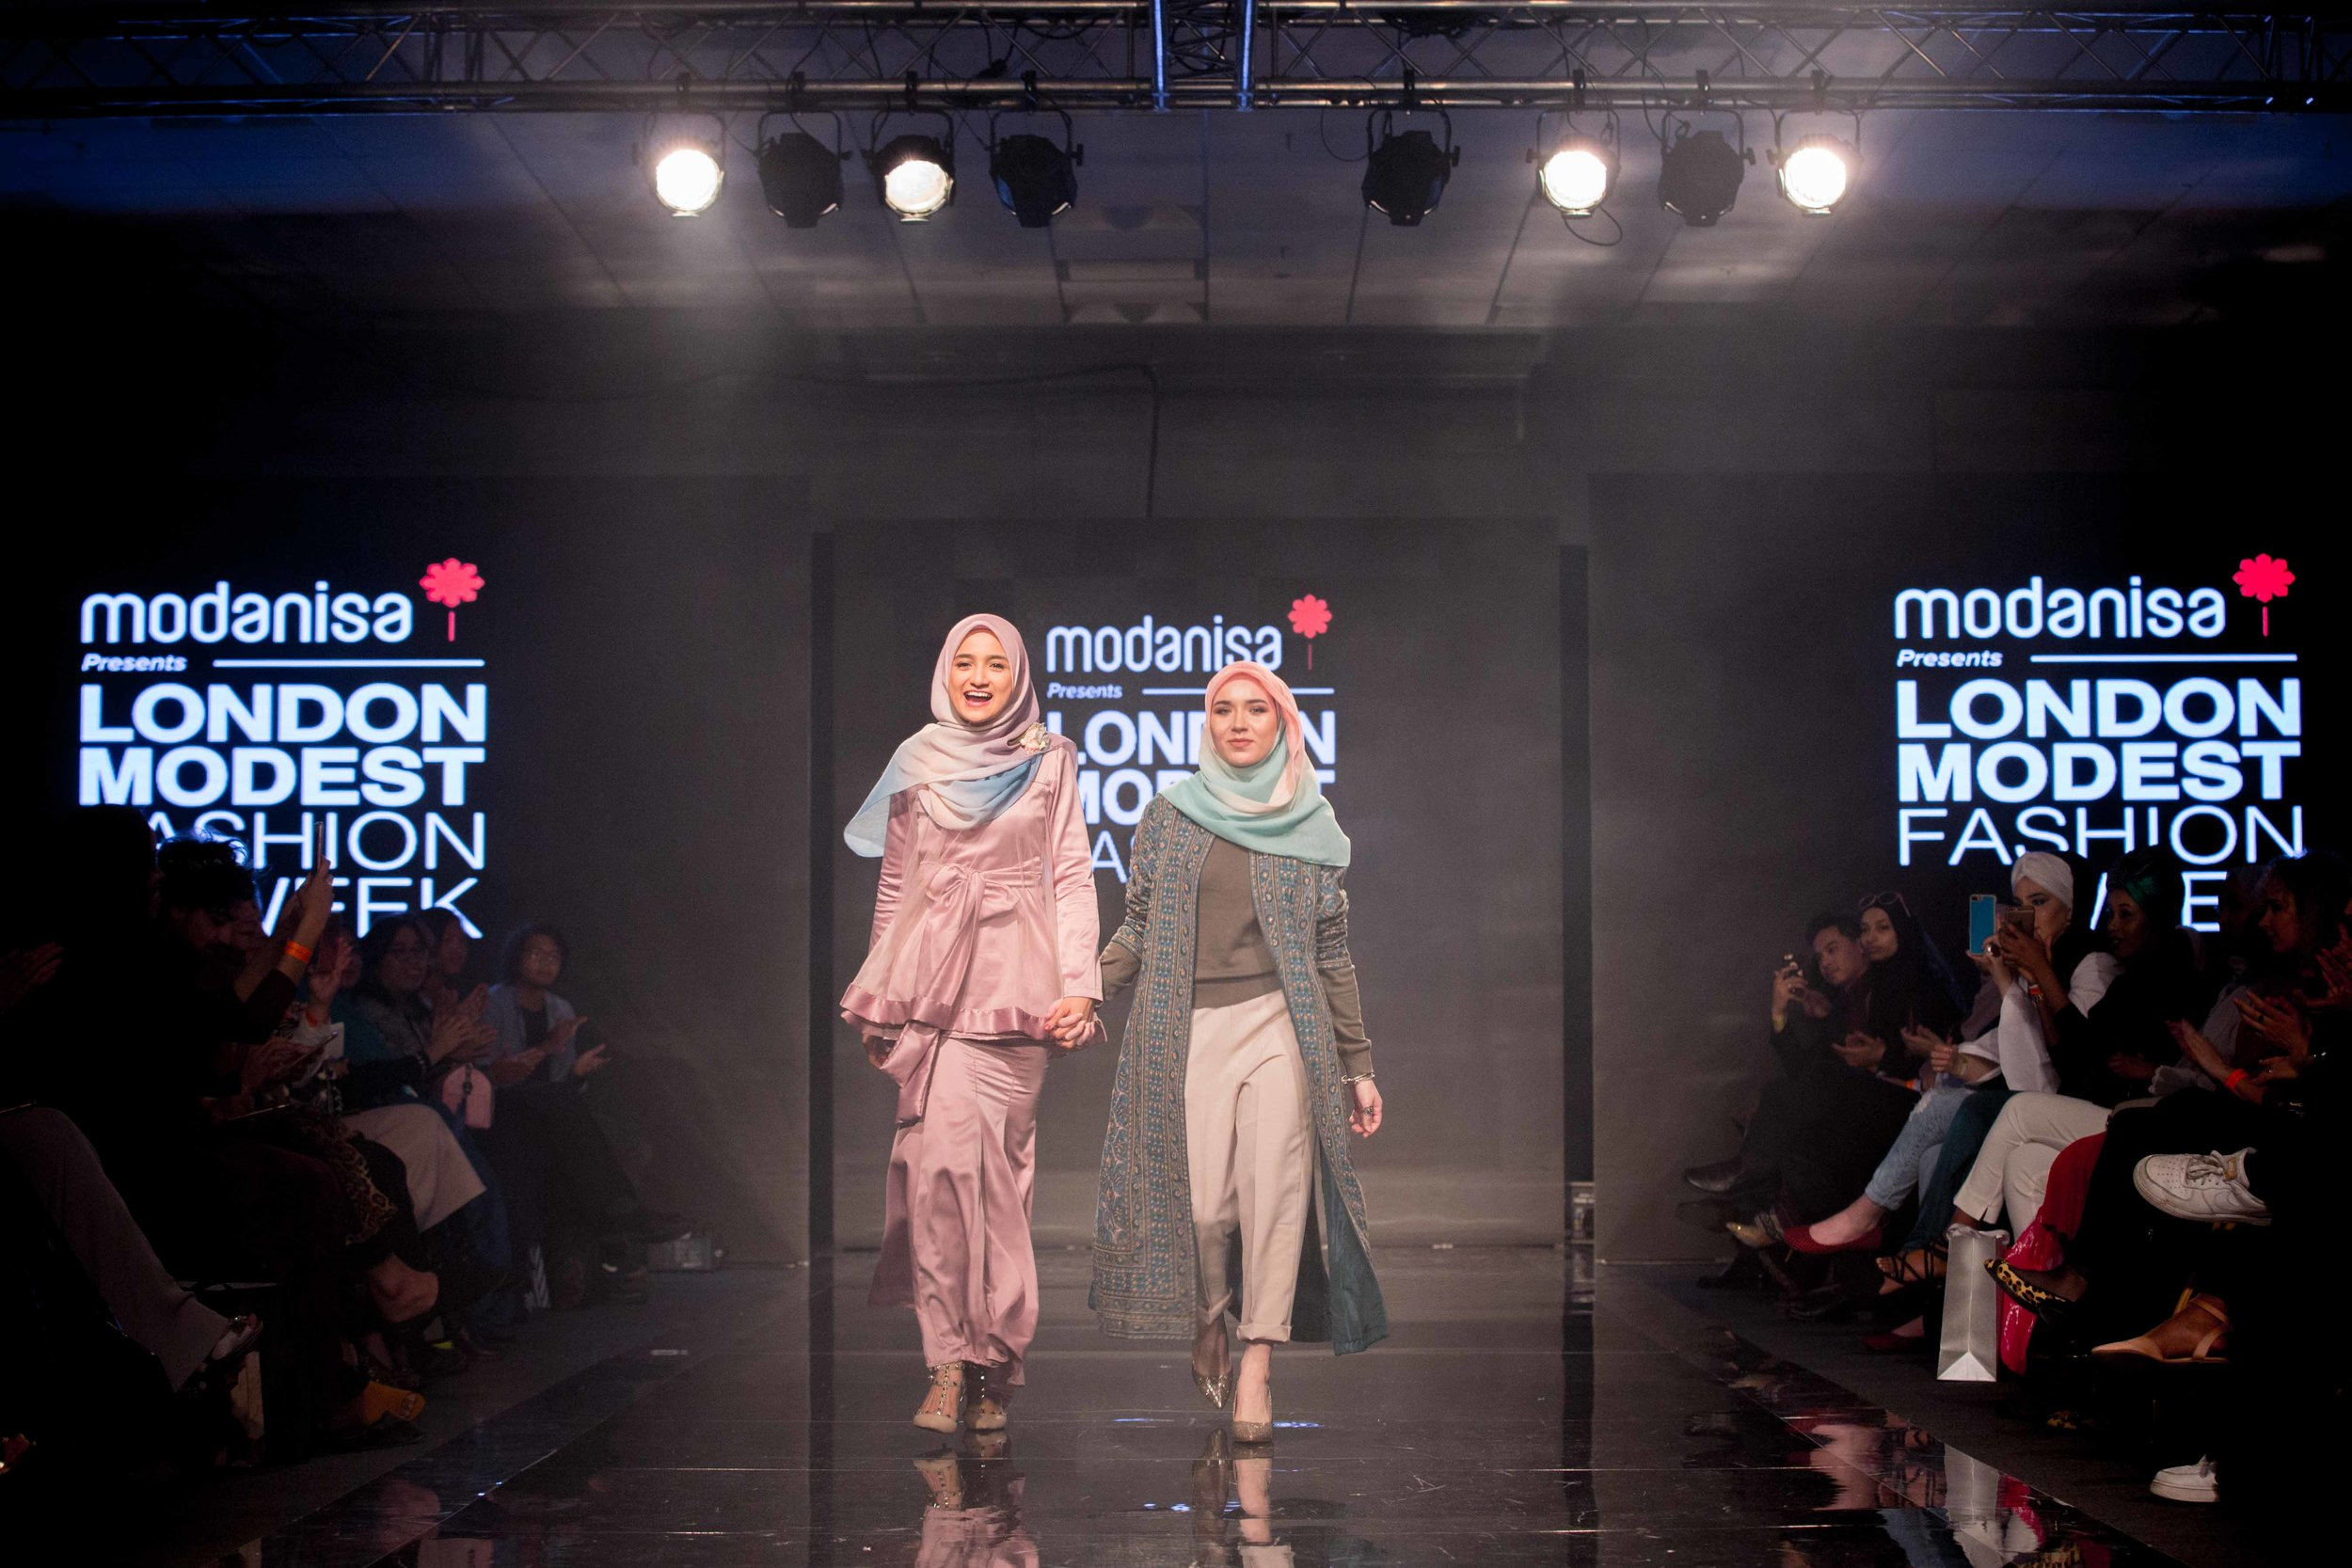 Aidijuma-London-Modest-Fashion-Week-catwalk-photographer-natalia-smith-photography-4.jpg